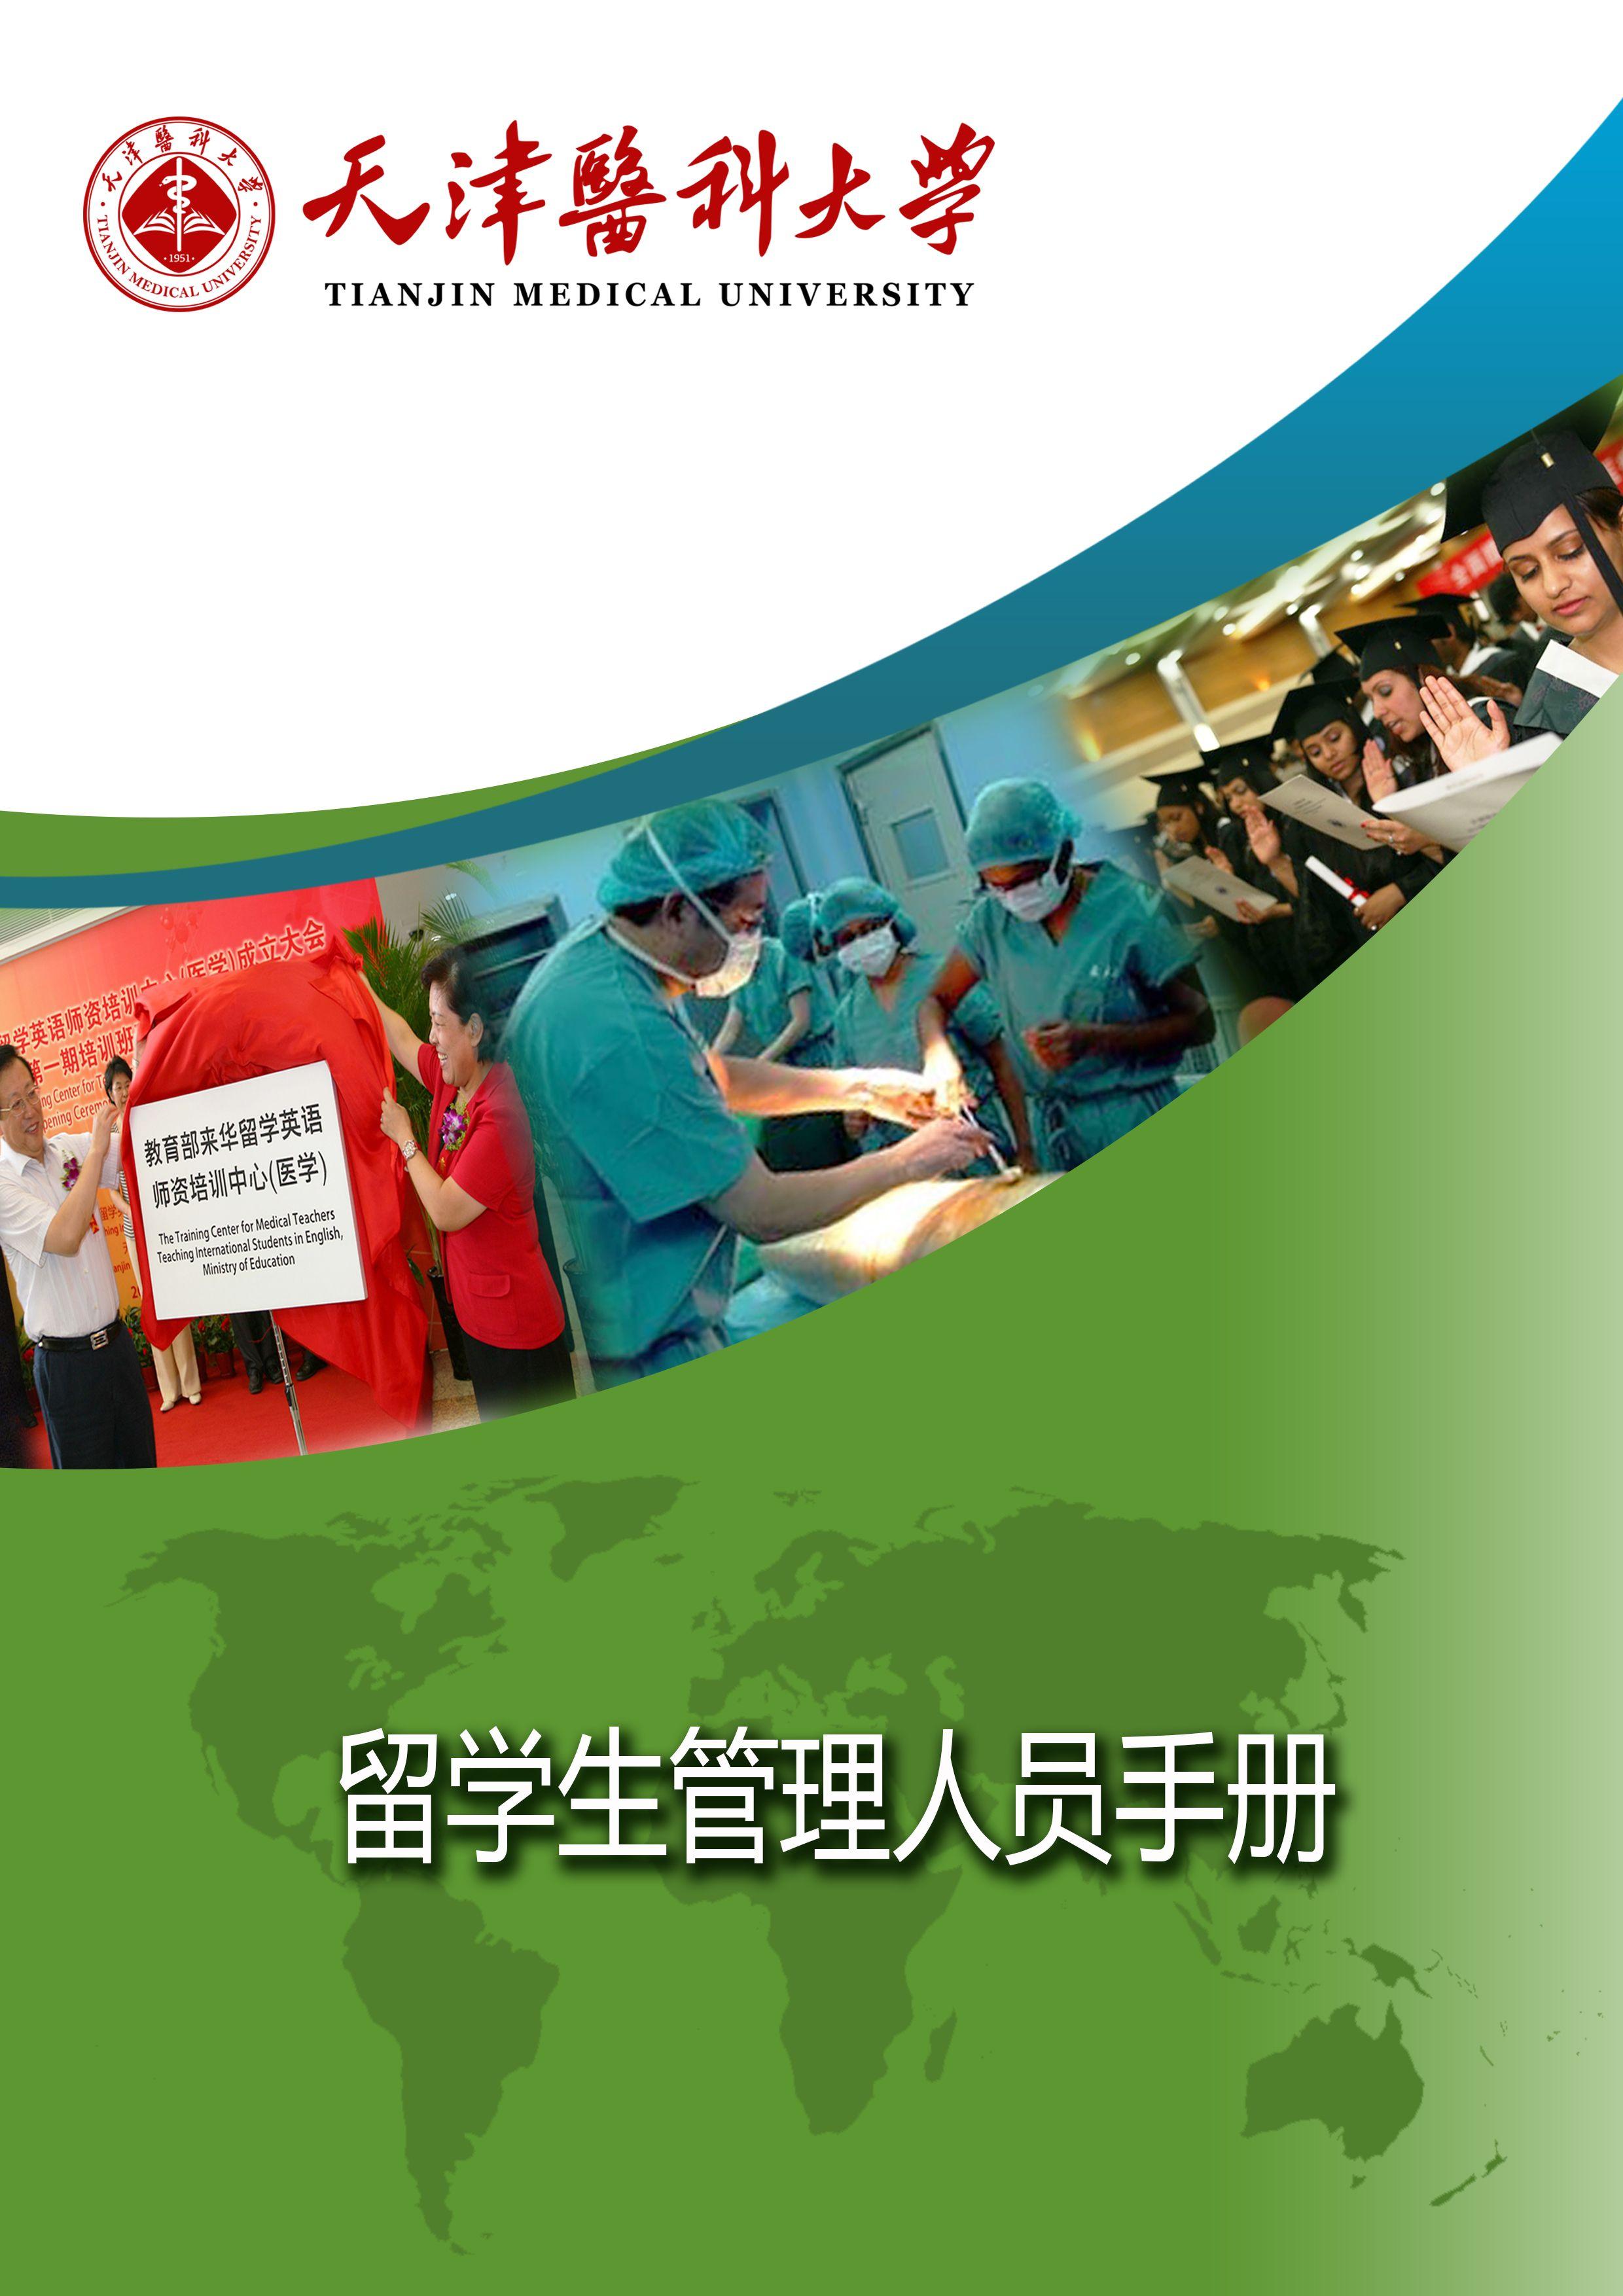 University Book Cover Design : Book cover design for teacher handbook of international